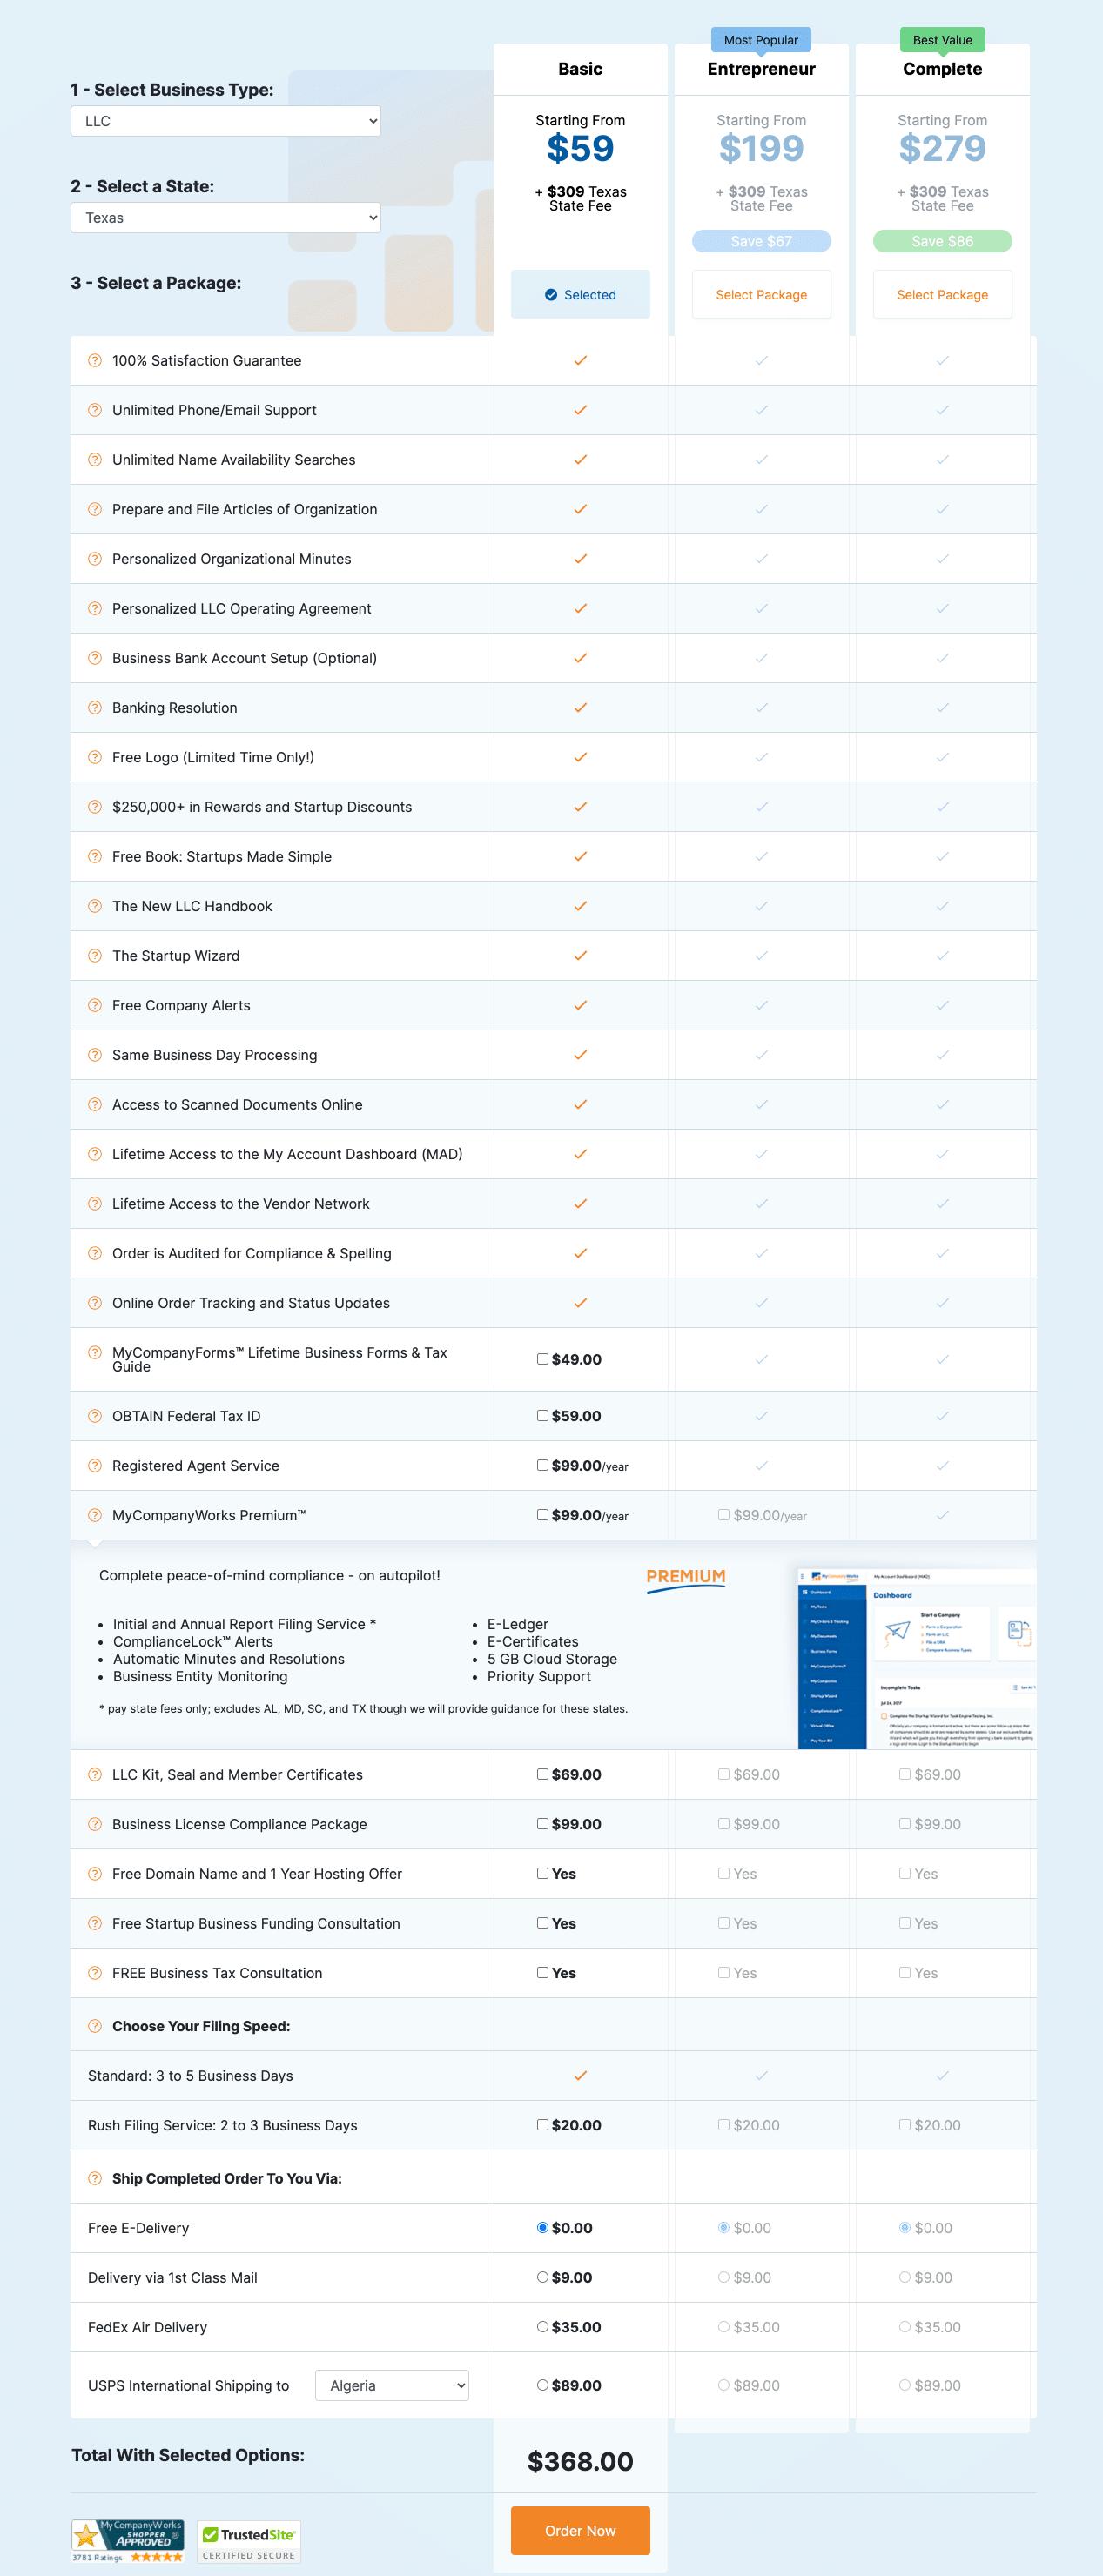 my company works price